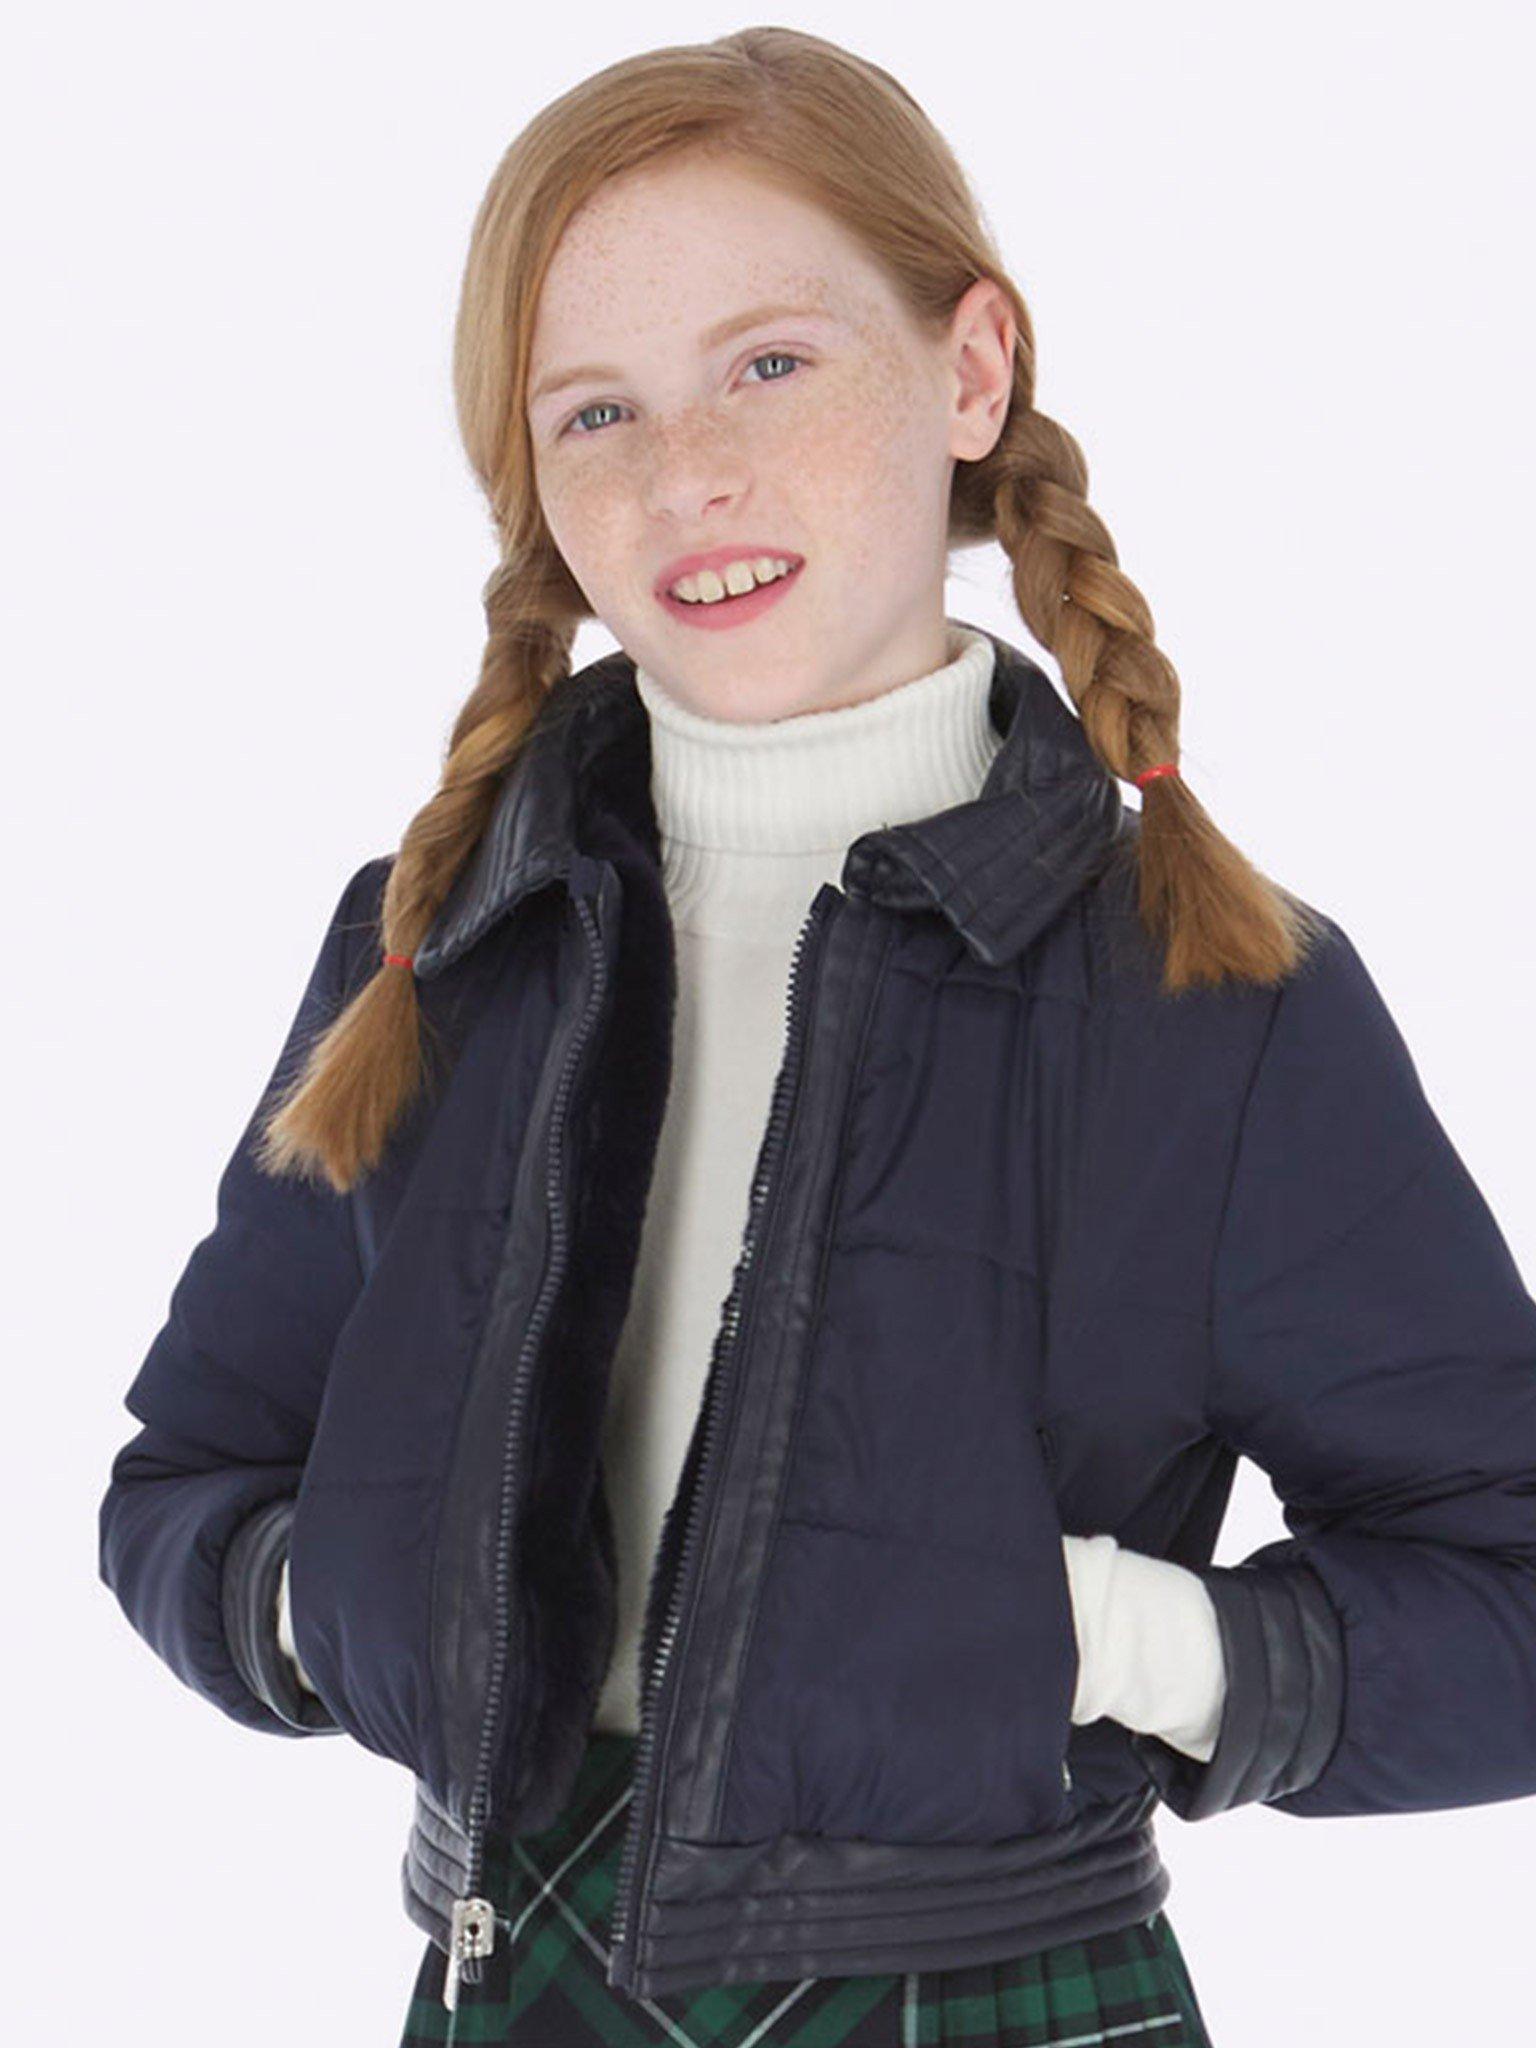 Áo phao bé gái màu navy viền da - Mayoral